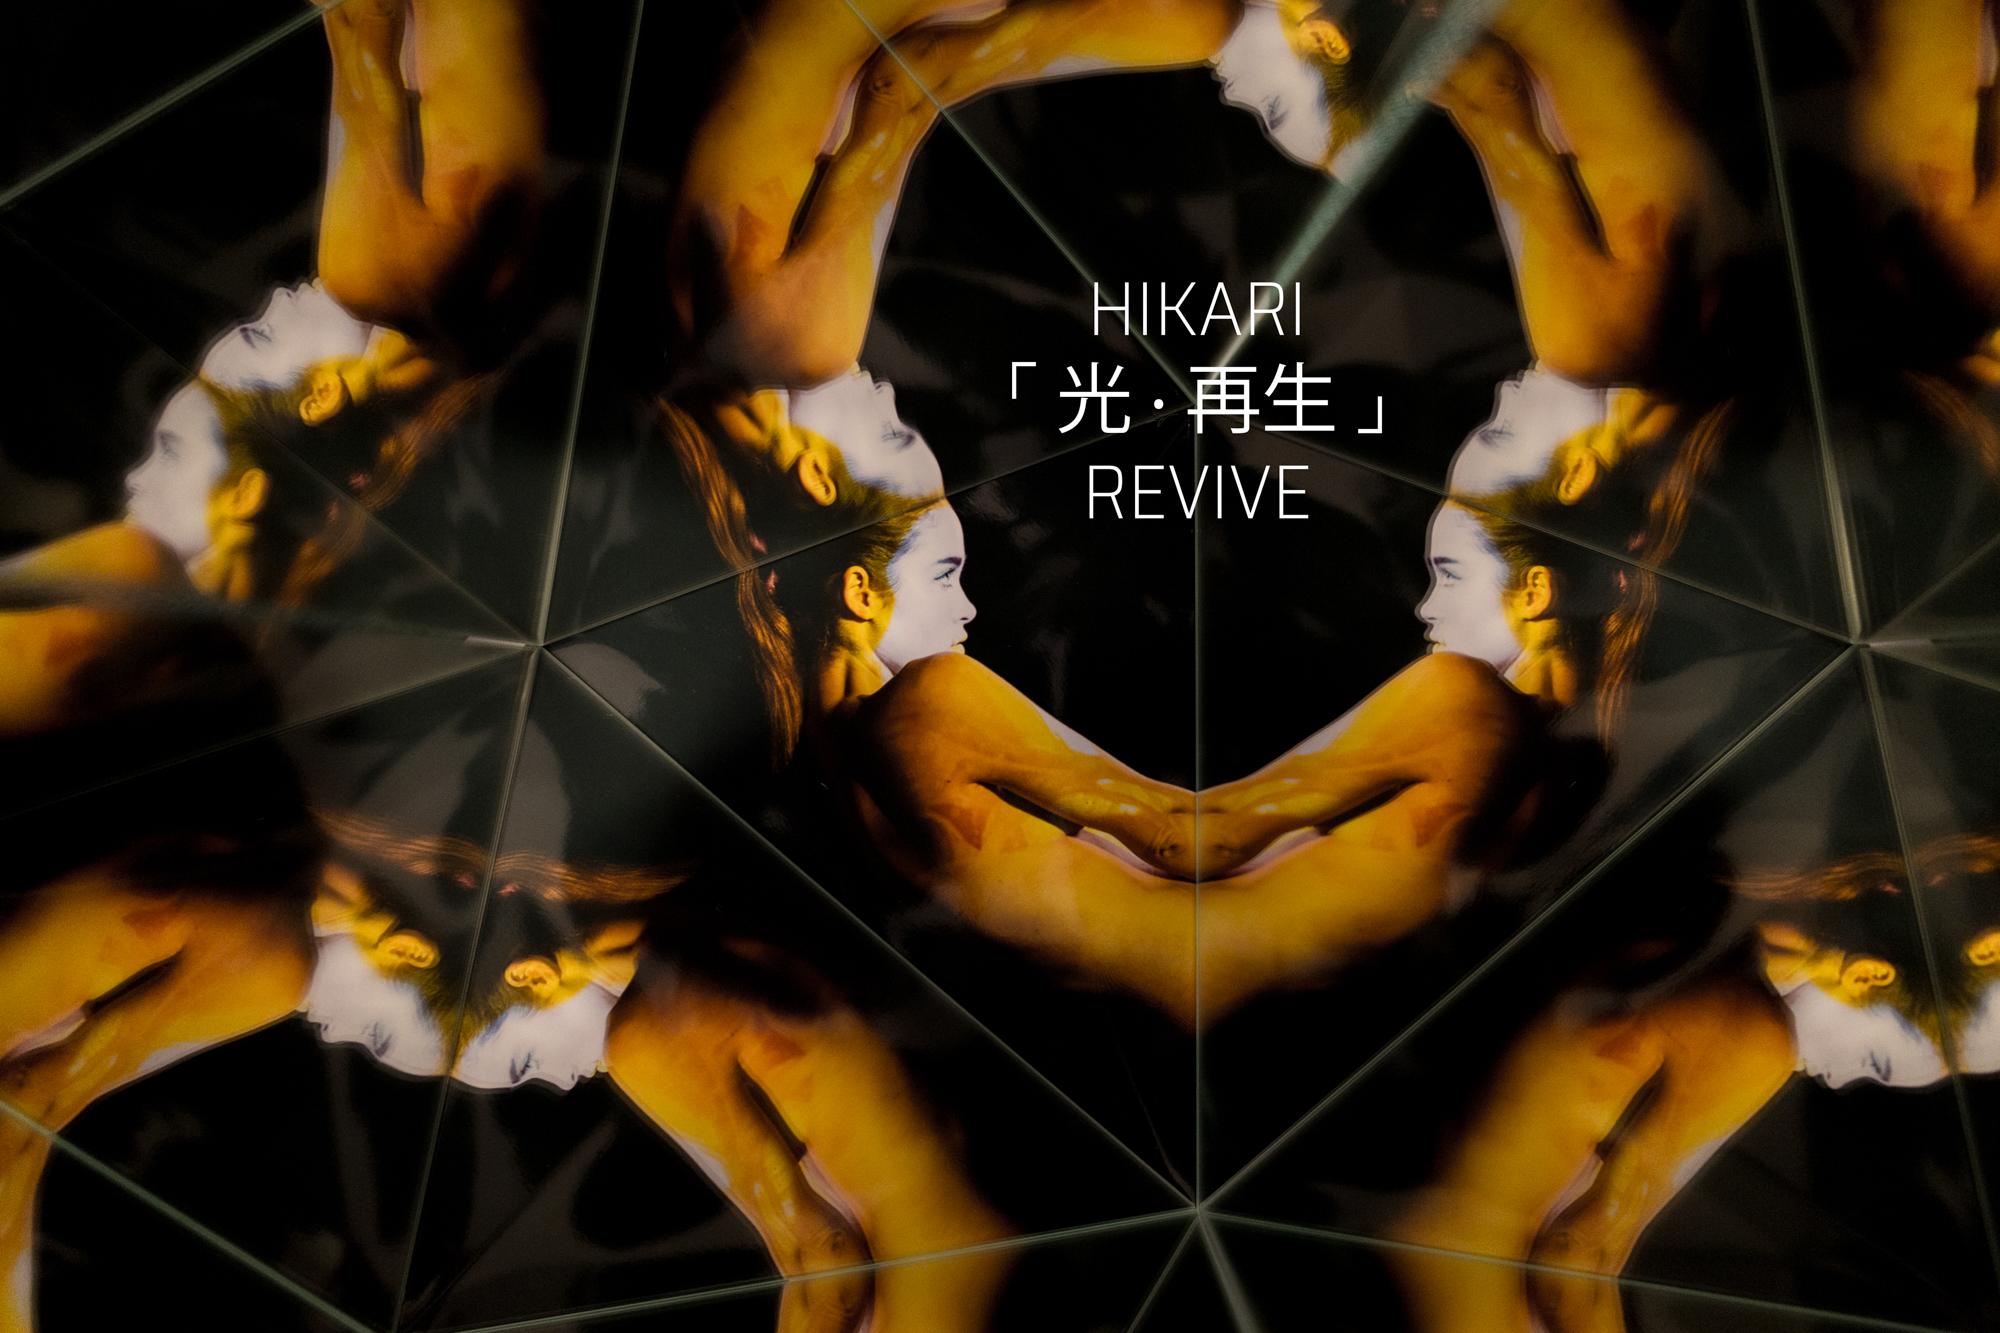 Hikari Revive 光・再生